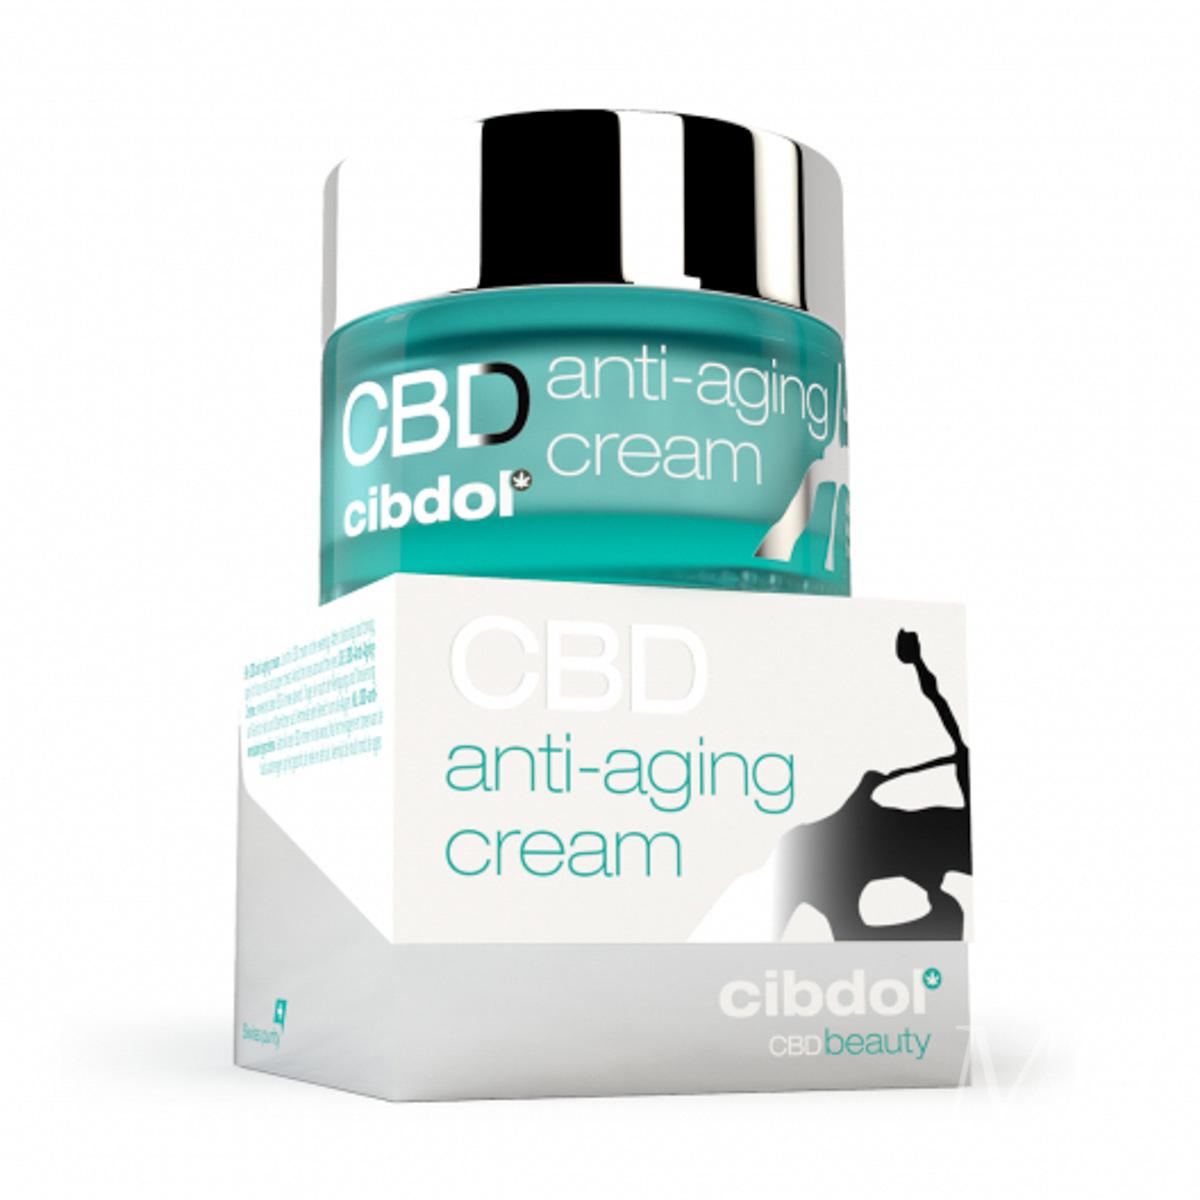 cibdol-cbd-anti-ageing-cream-grooming-mens-skincare-product-man-for-himself